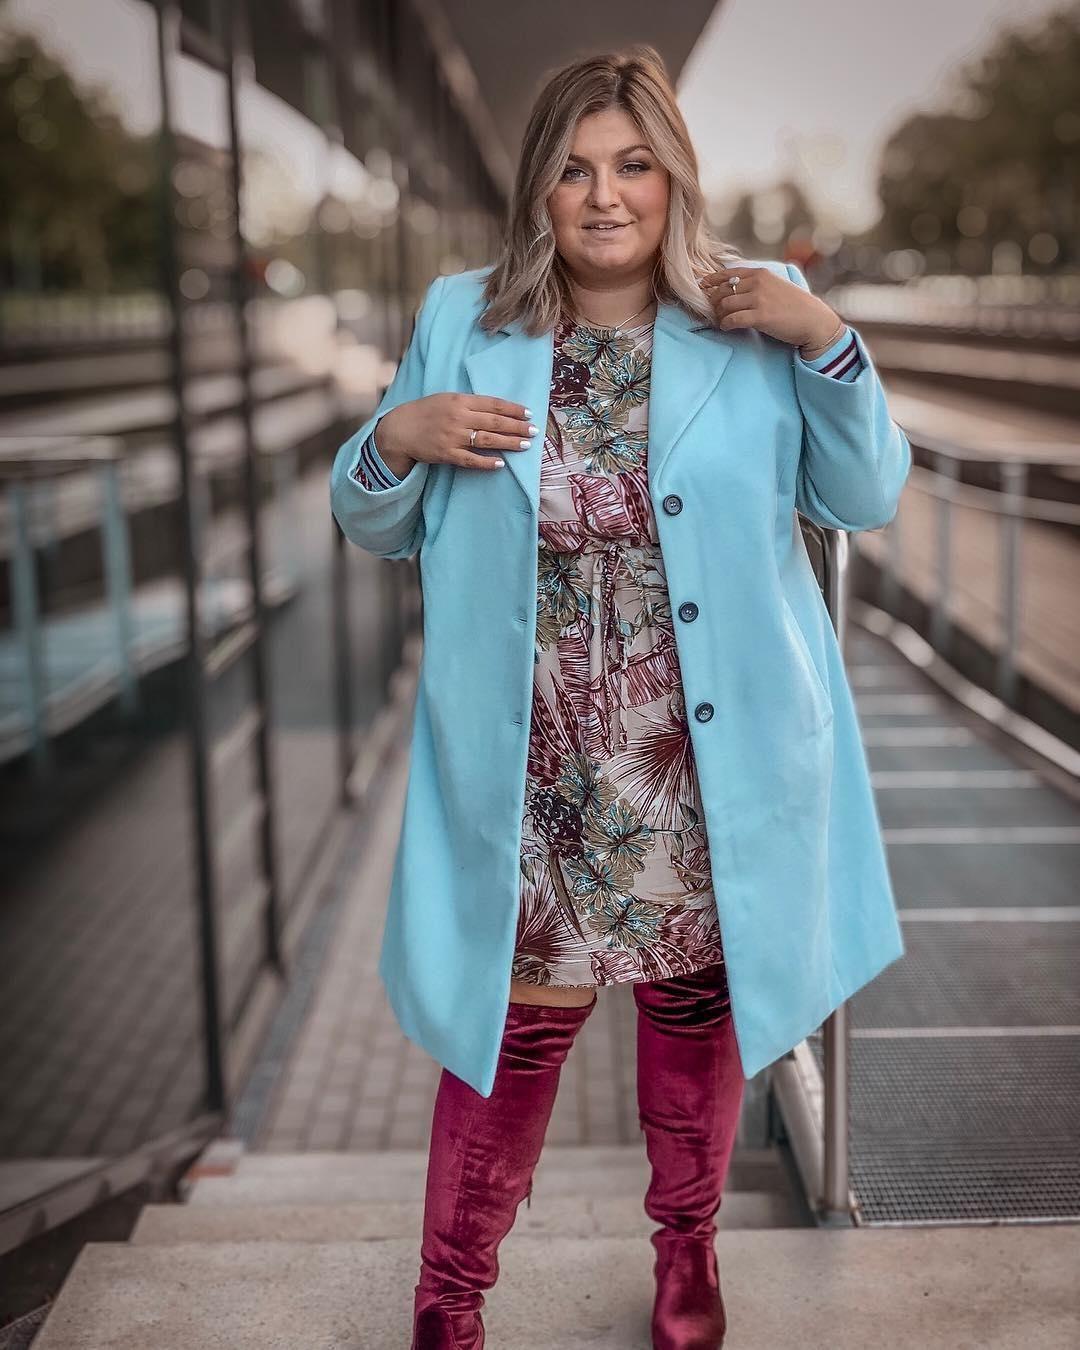 c0b00722374 40 Best Women s Plus Size Fashion Trends   Outfit Ideas for Winter   plussize  plussizeclothing  plussizefashion  plussizeoutfits